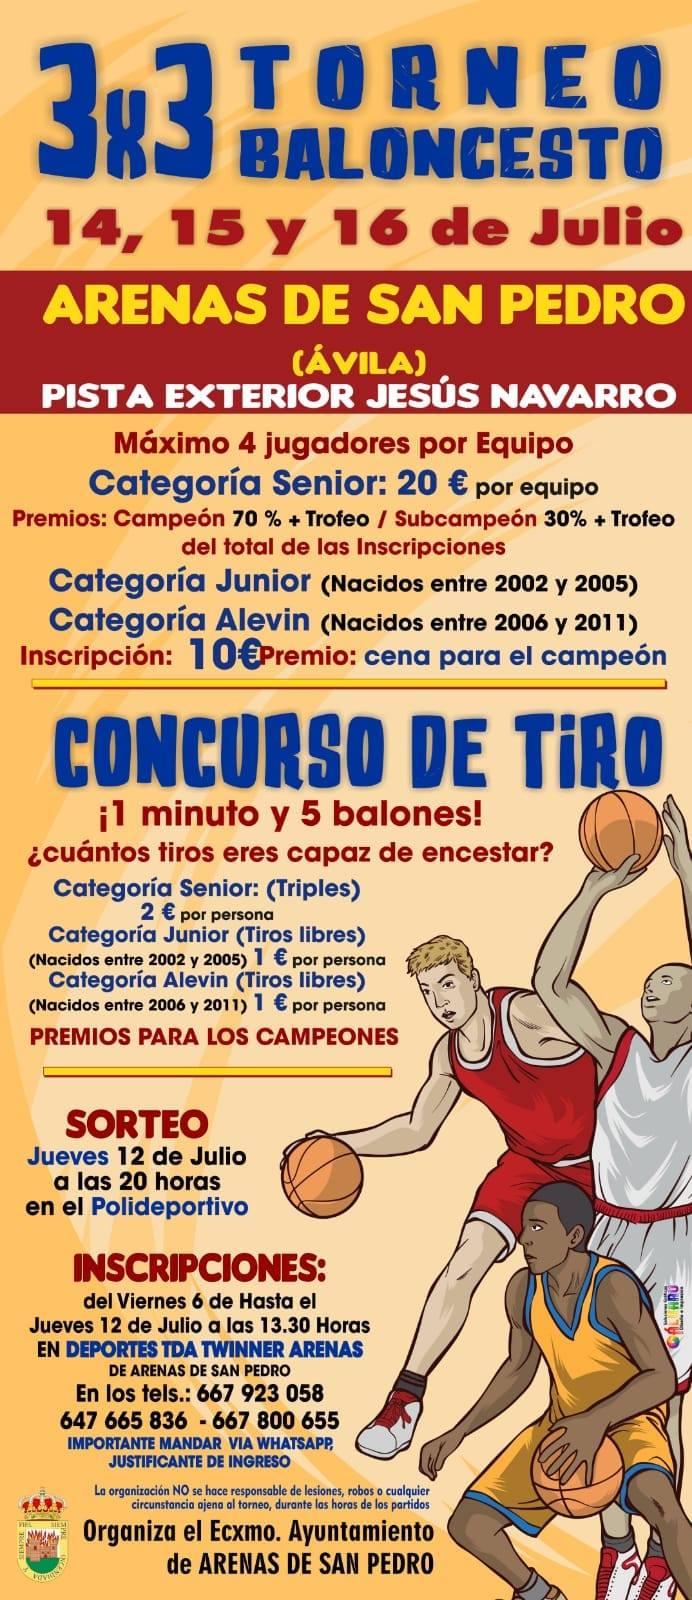 Trofeo 3x3 Baloncesto - Arenas de San Pedro - TiétarTeVe